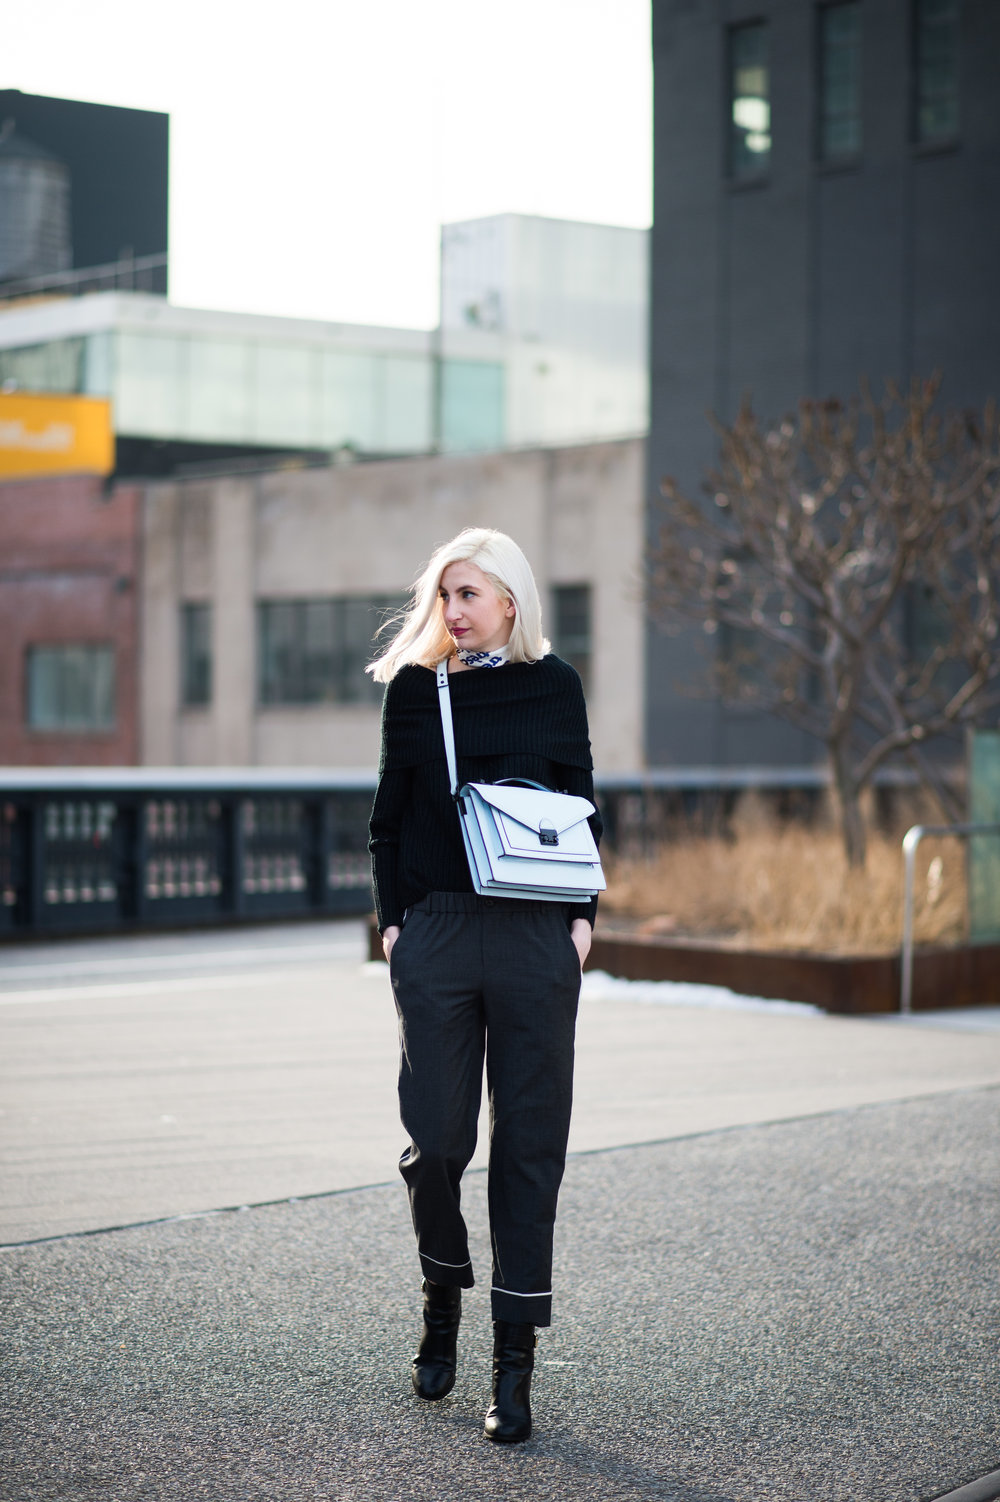 loeffler randall bag, j.crew pj pants, silk scarf, outfit ideas for women, fall and winter fashion